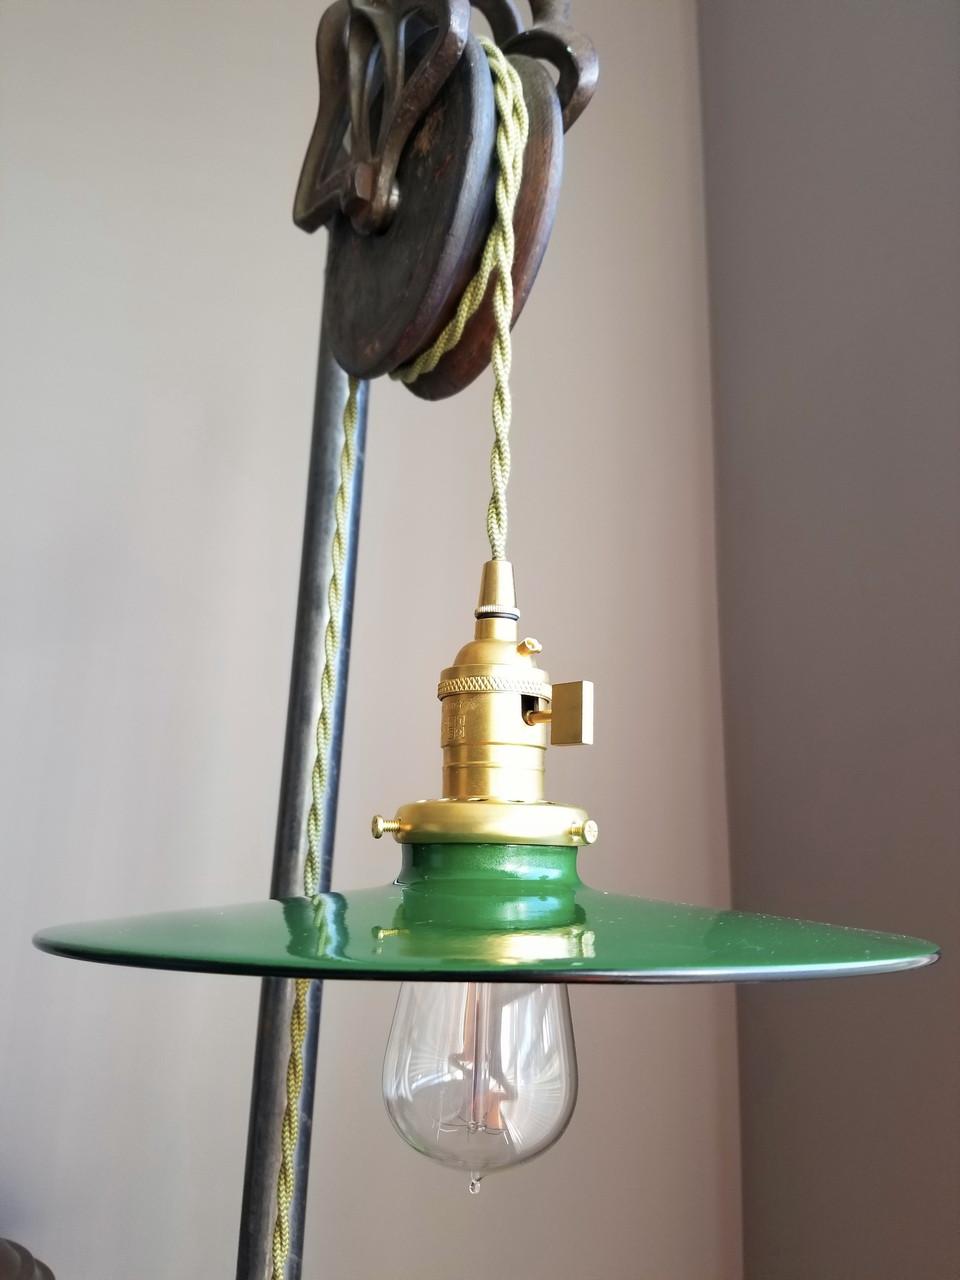 Green Porcelain Enamel Shade 10 25 Flat Saucer Industrial Metal 2 1 4 Fitter Metal Lampshade